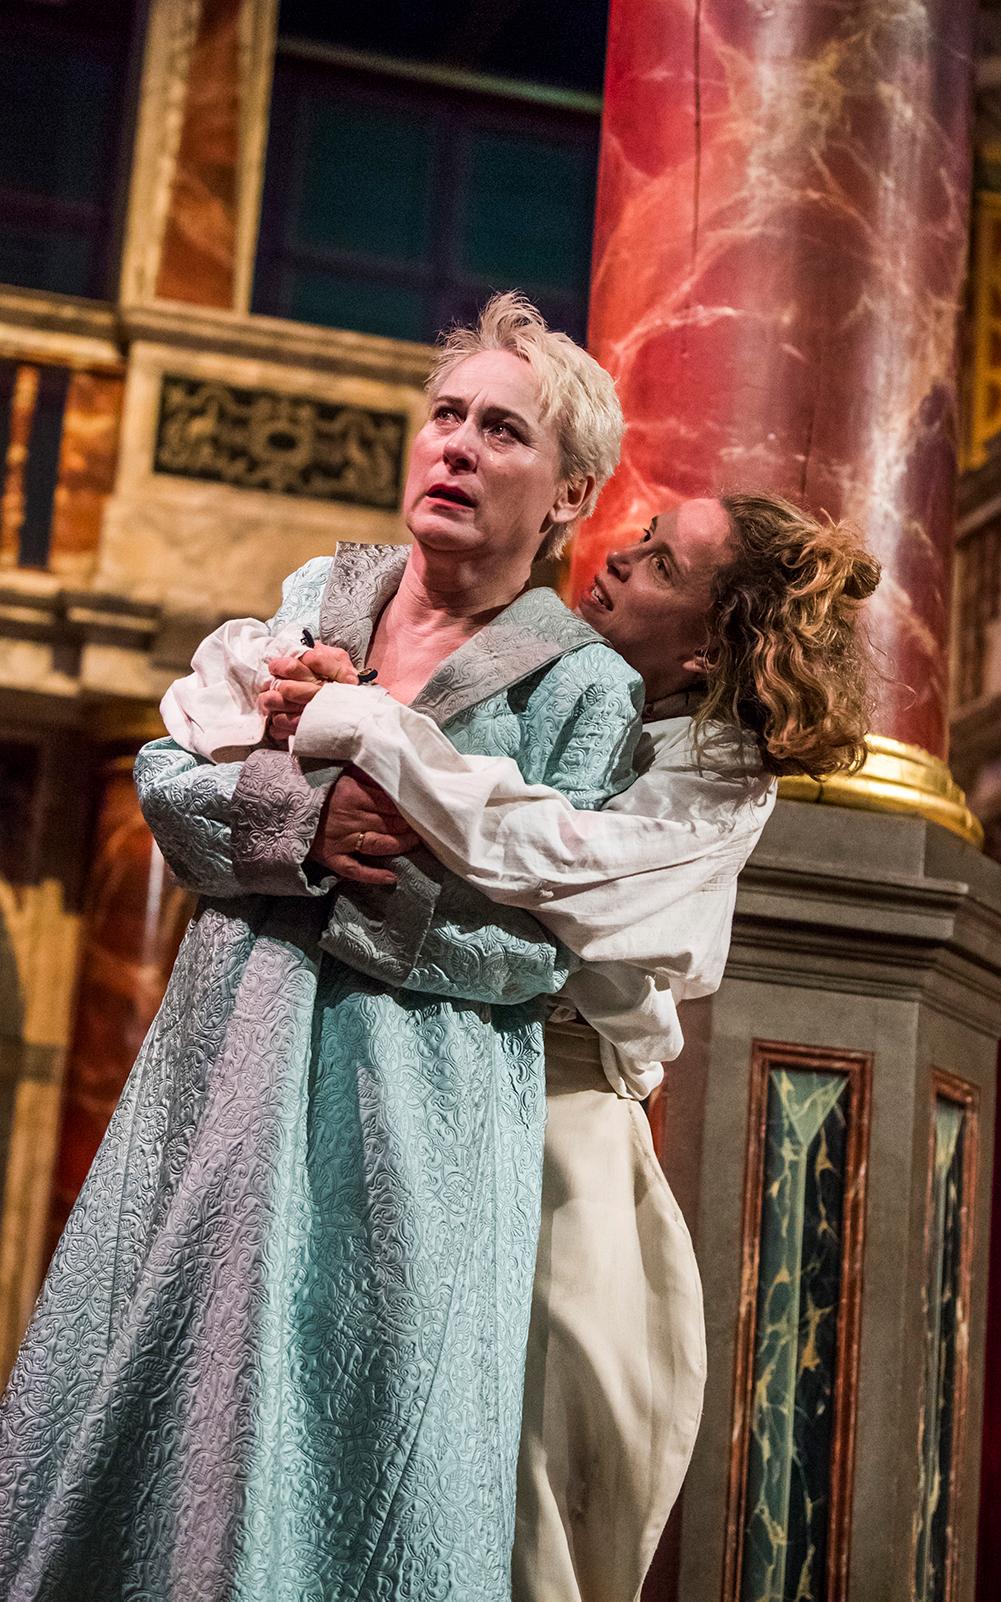 Hamlet standing behind Gertrude with arms around her